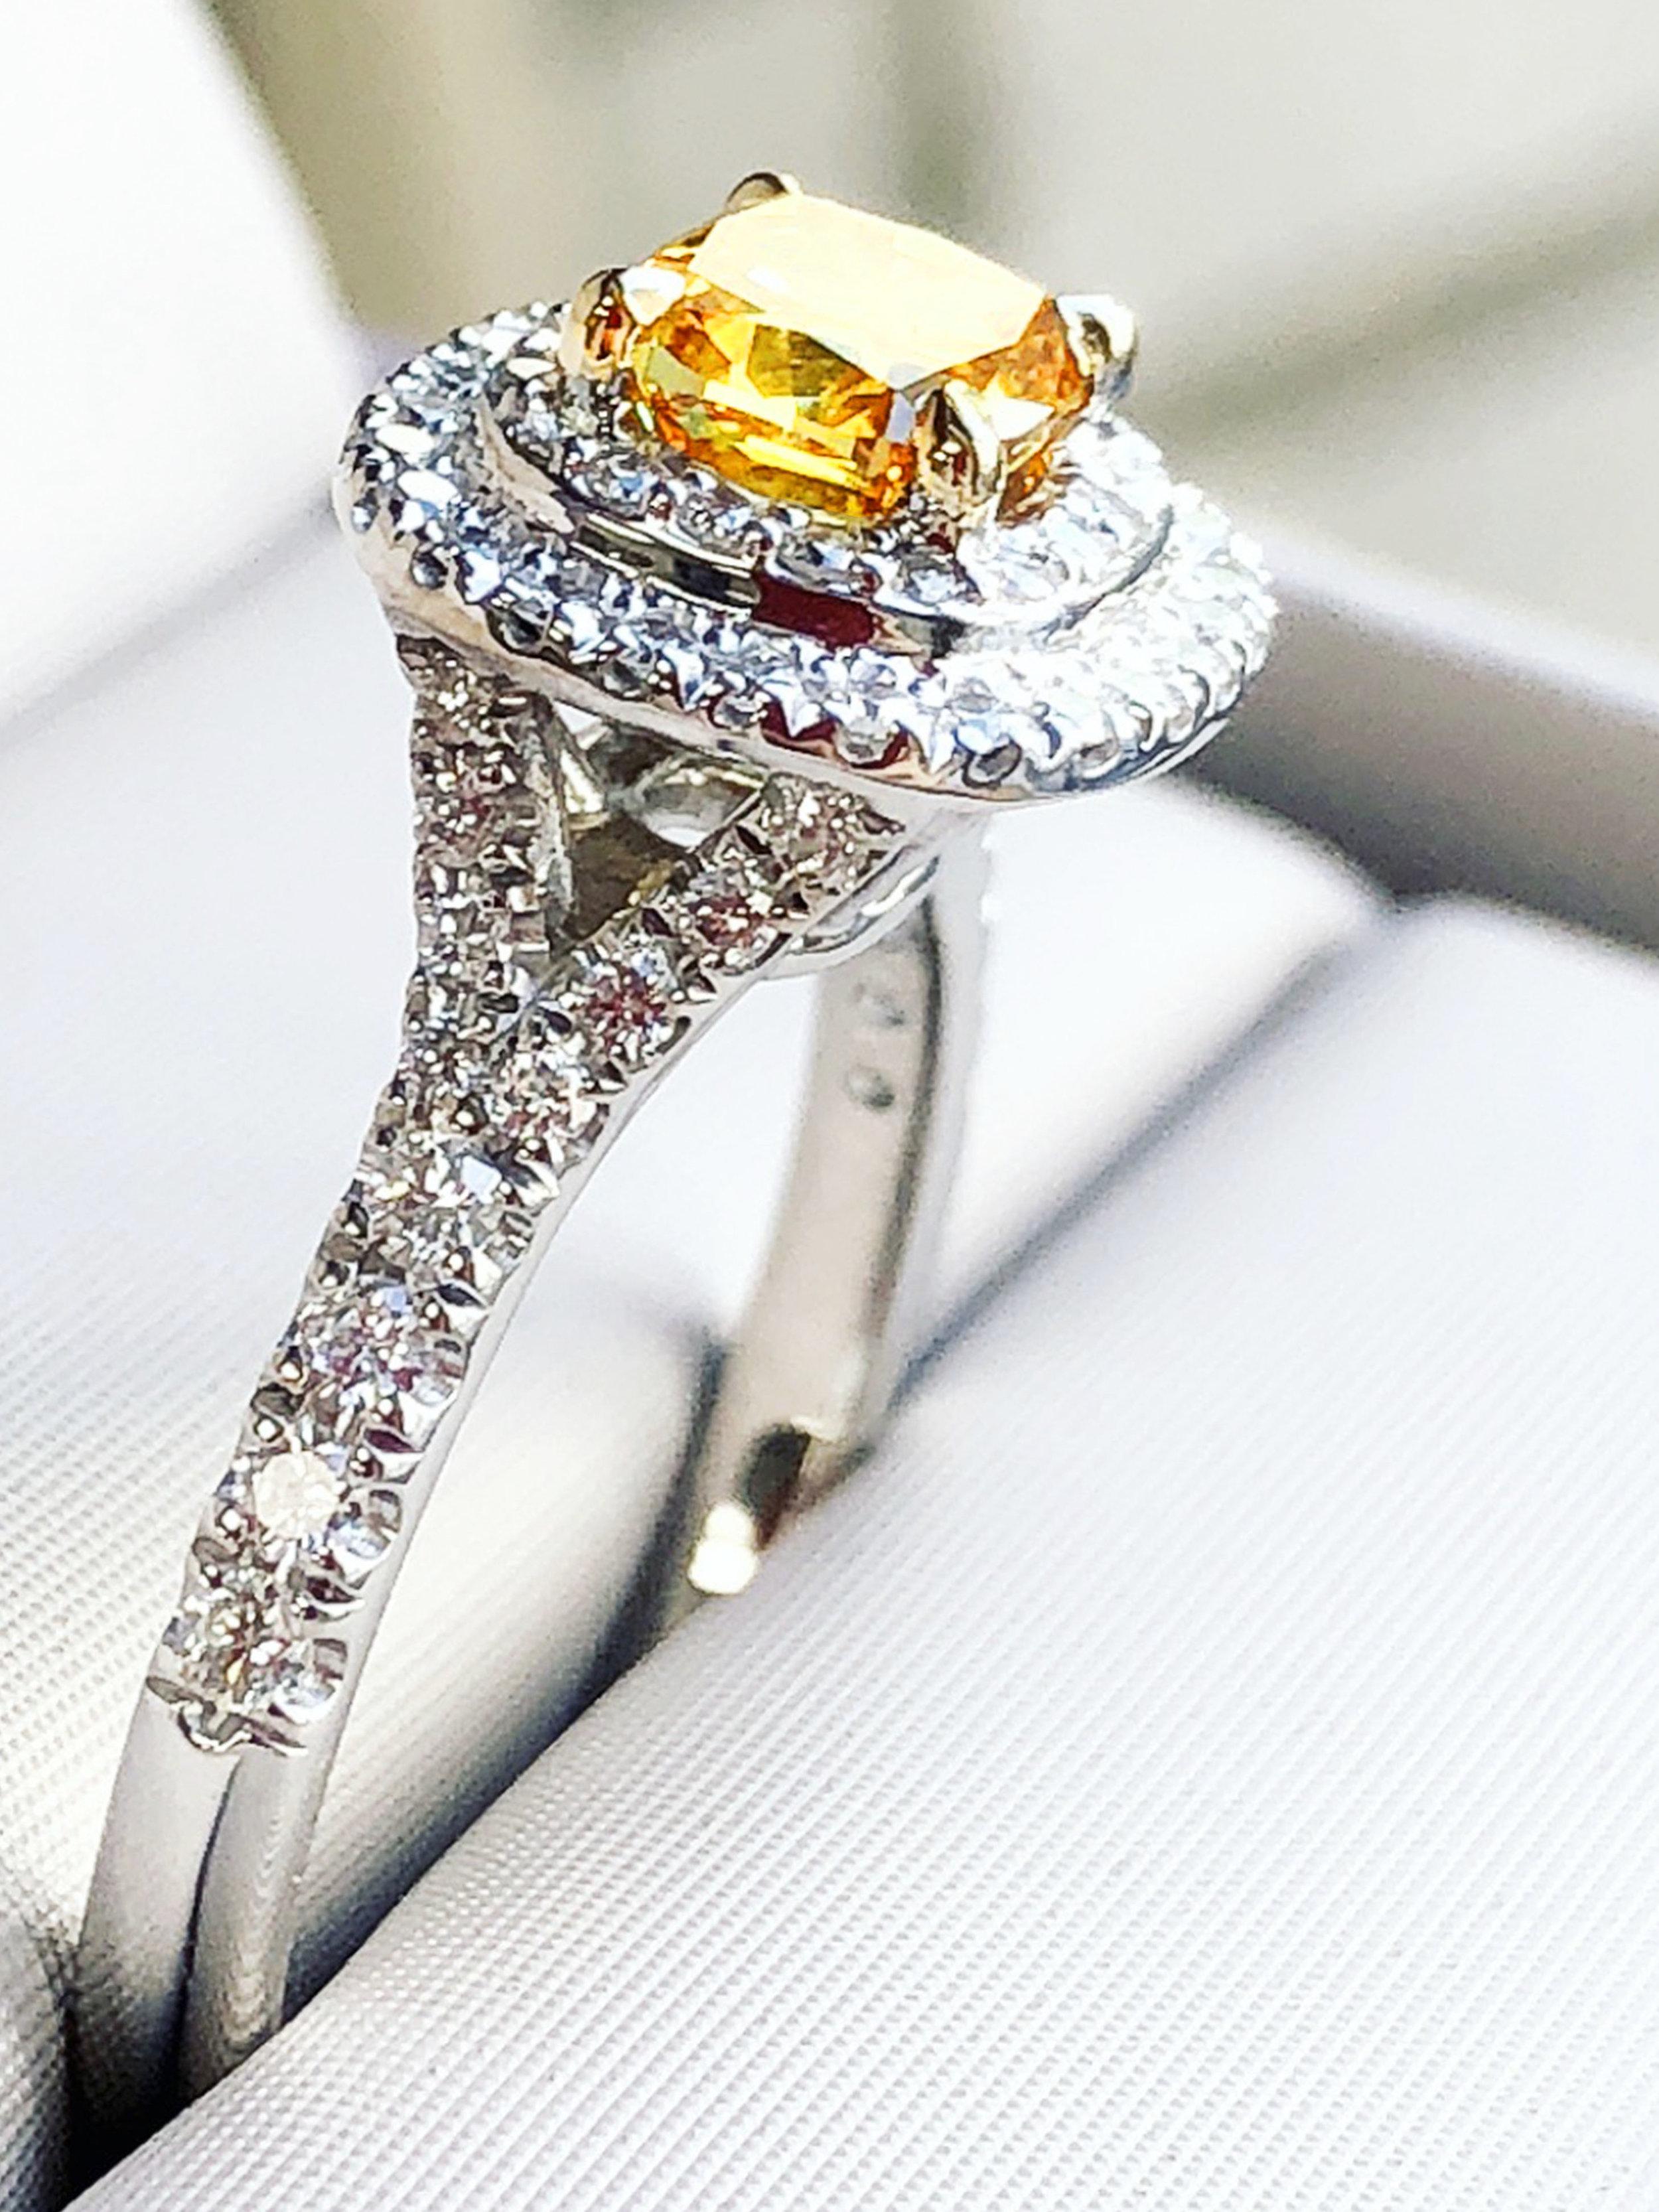 The ORANGE diamond.Double row of white diamonds feature a rarer than rare, orange diamond. A fresh, unique and captivating piece. -